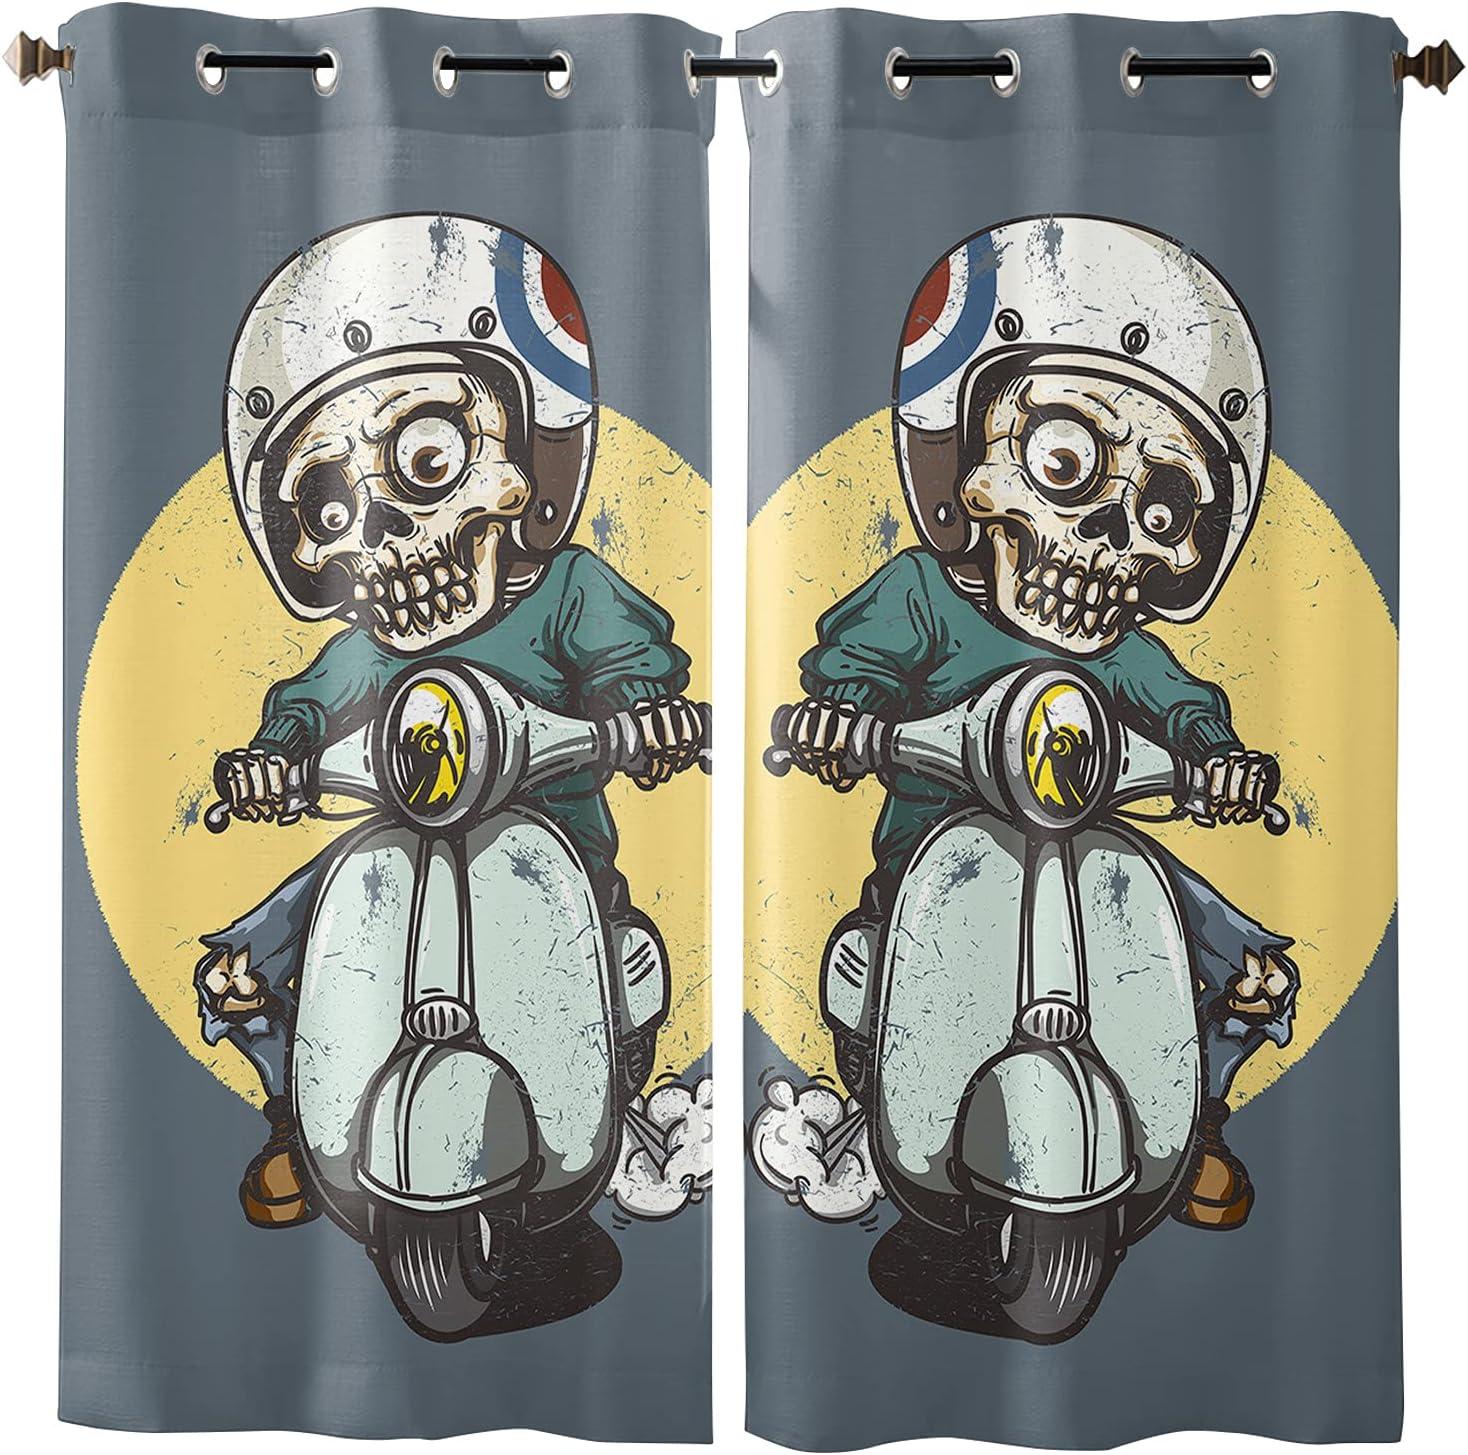 Cartoon Skull Teenager Riding a Motorcycle Rare Curtains o Dallas Mall Set Window